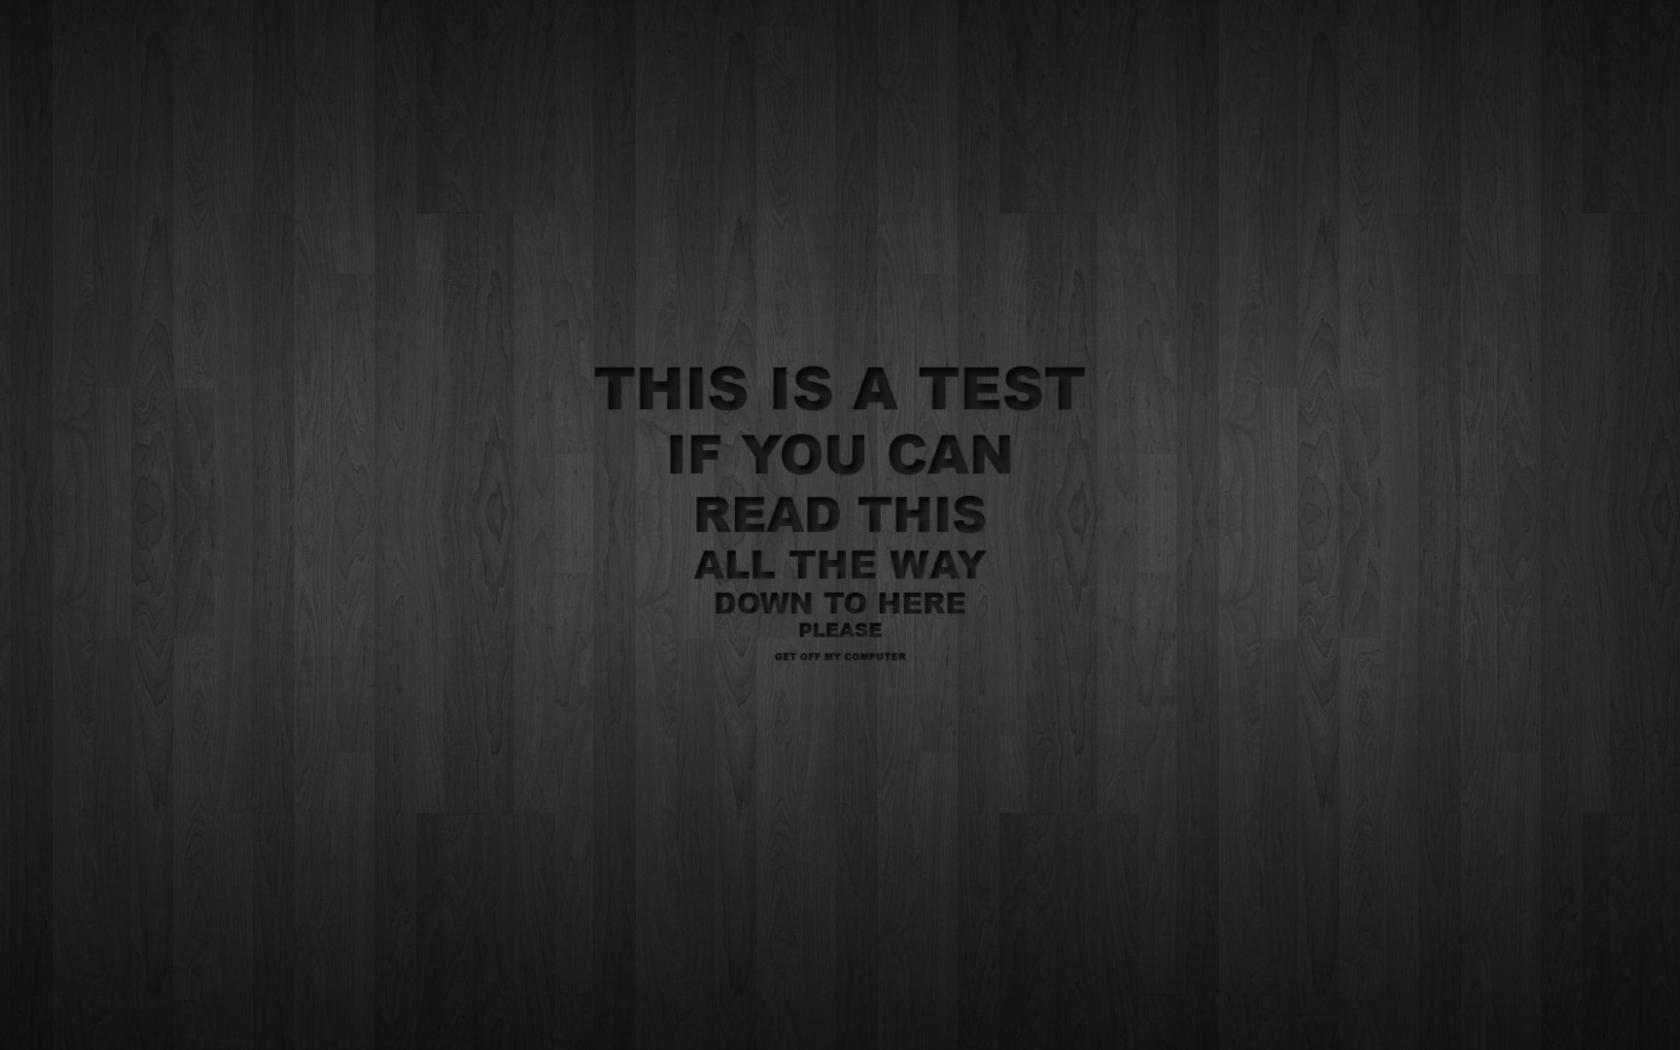 Free Download Dark Text Humor Funny Textures 1920x1080 Wallpaper